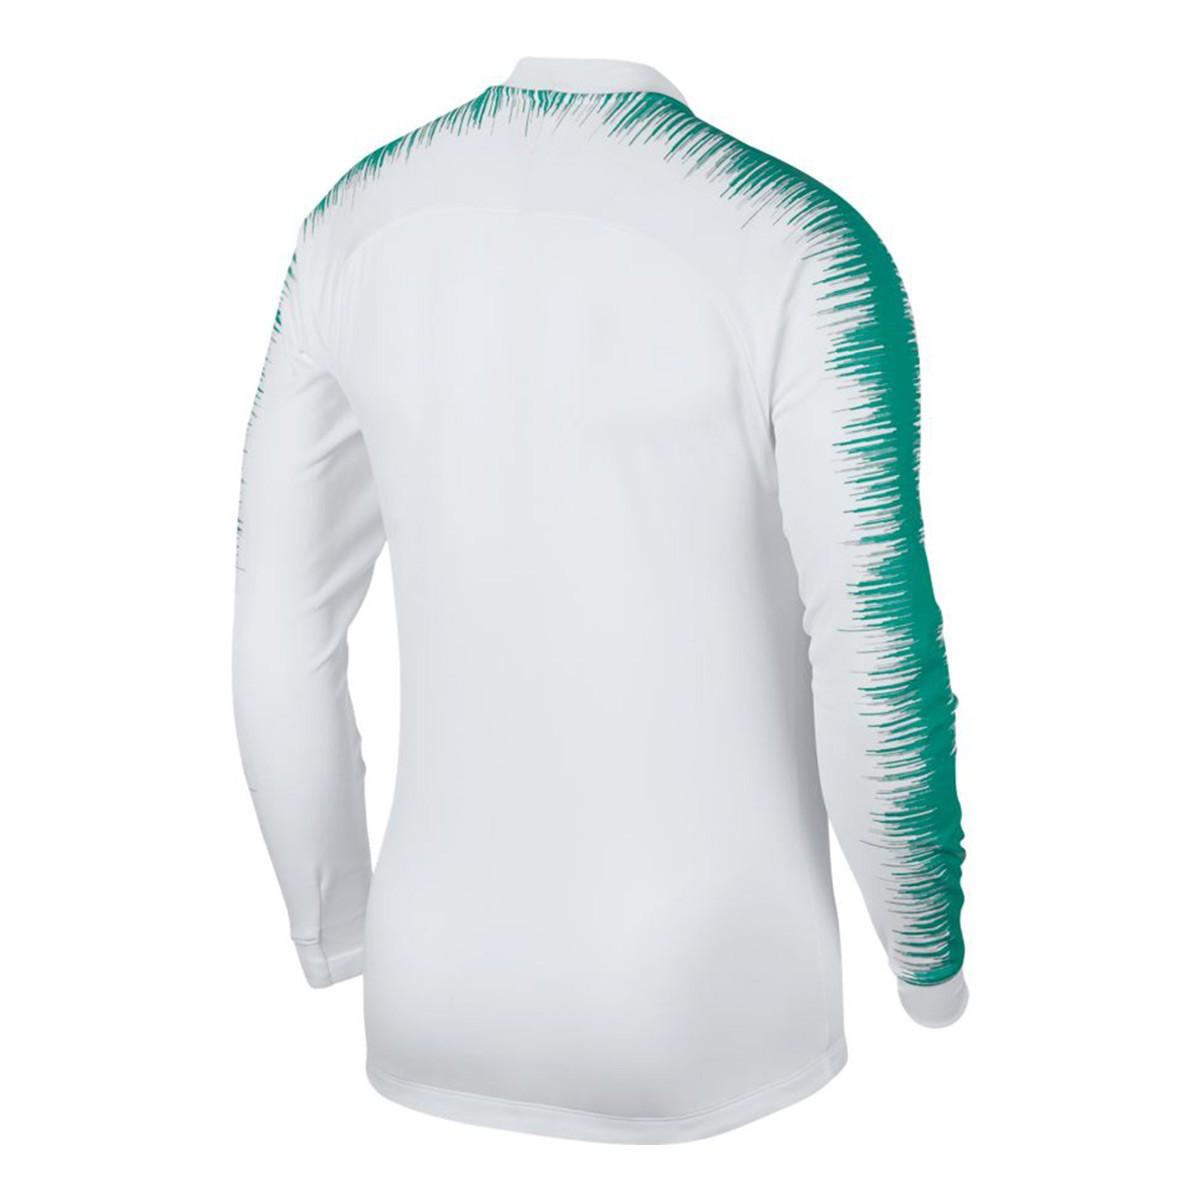 7433873a56c20 Chaqueta Nike Portugal Pre-Match 2018-2019 White-Kinetic green-Gym red -  Tienda de fútbol Fútbol Emotion